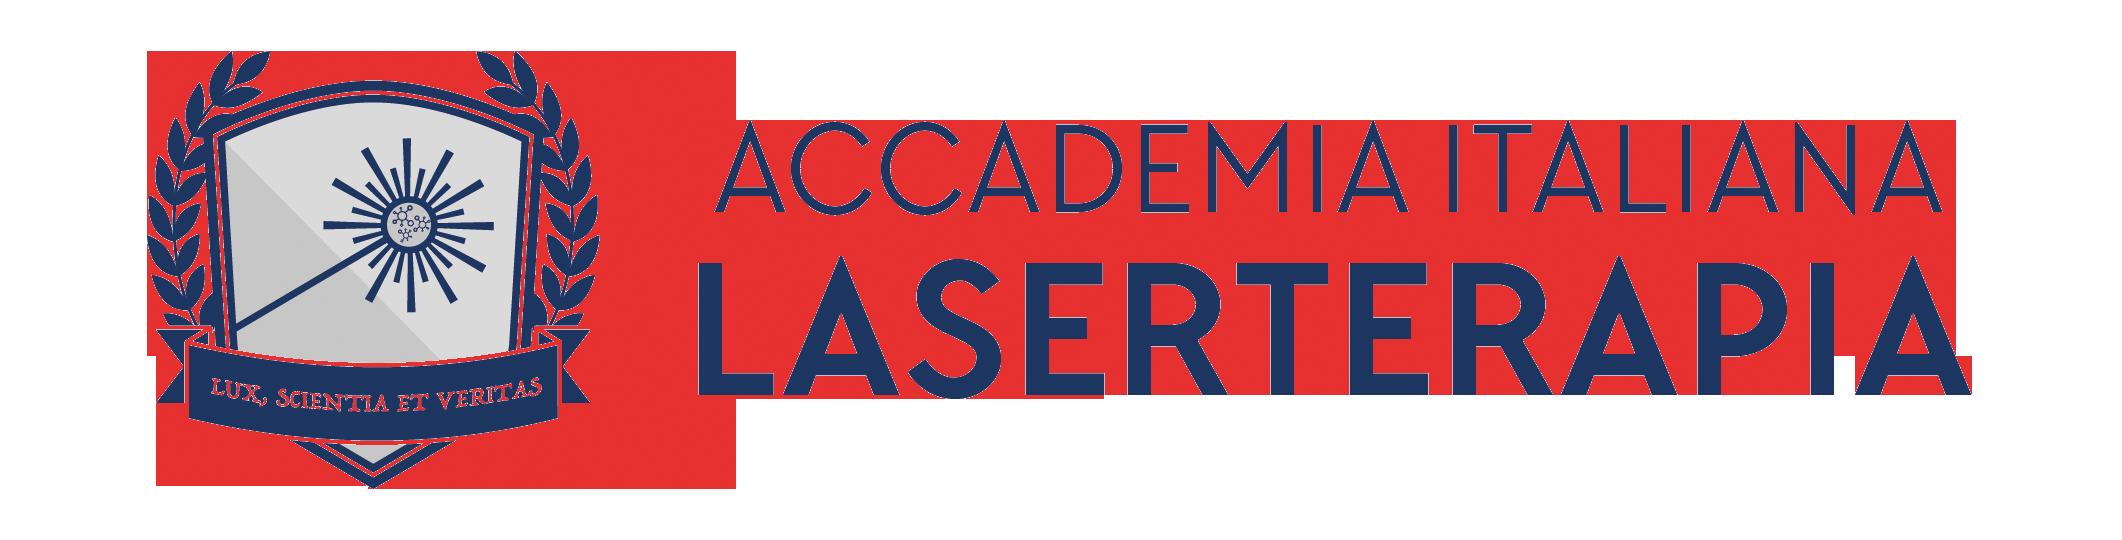 Accademia Italiana Laserterapia